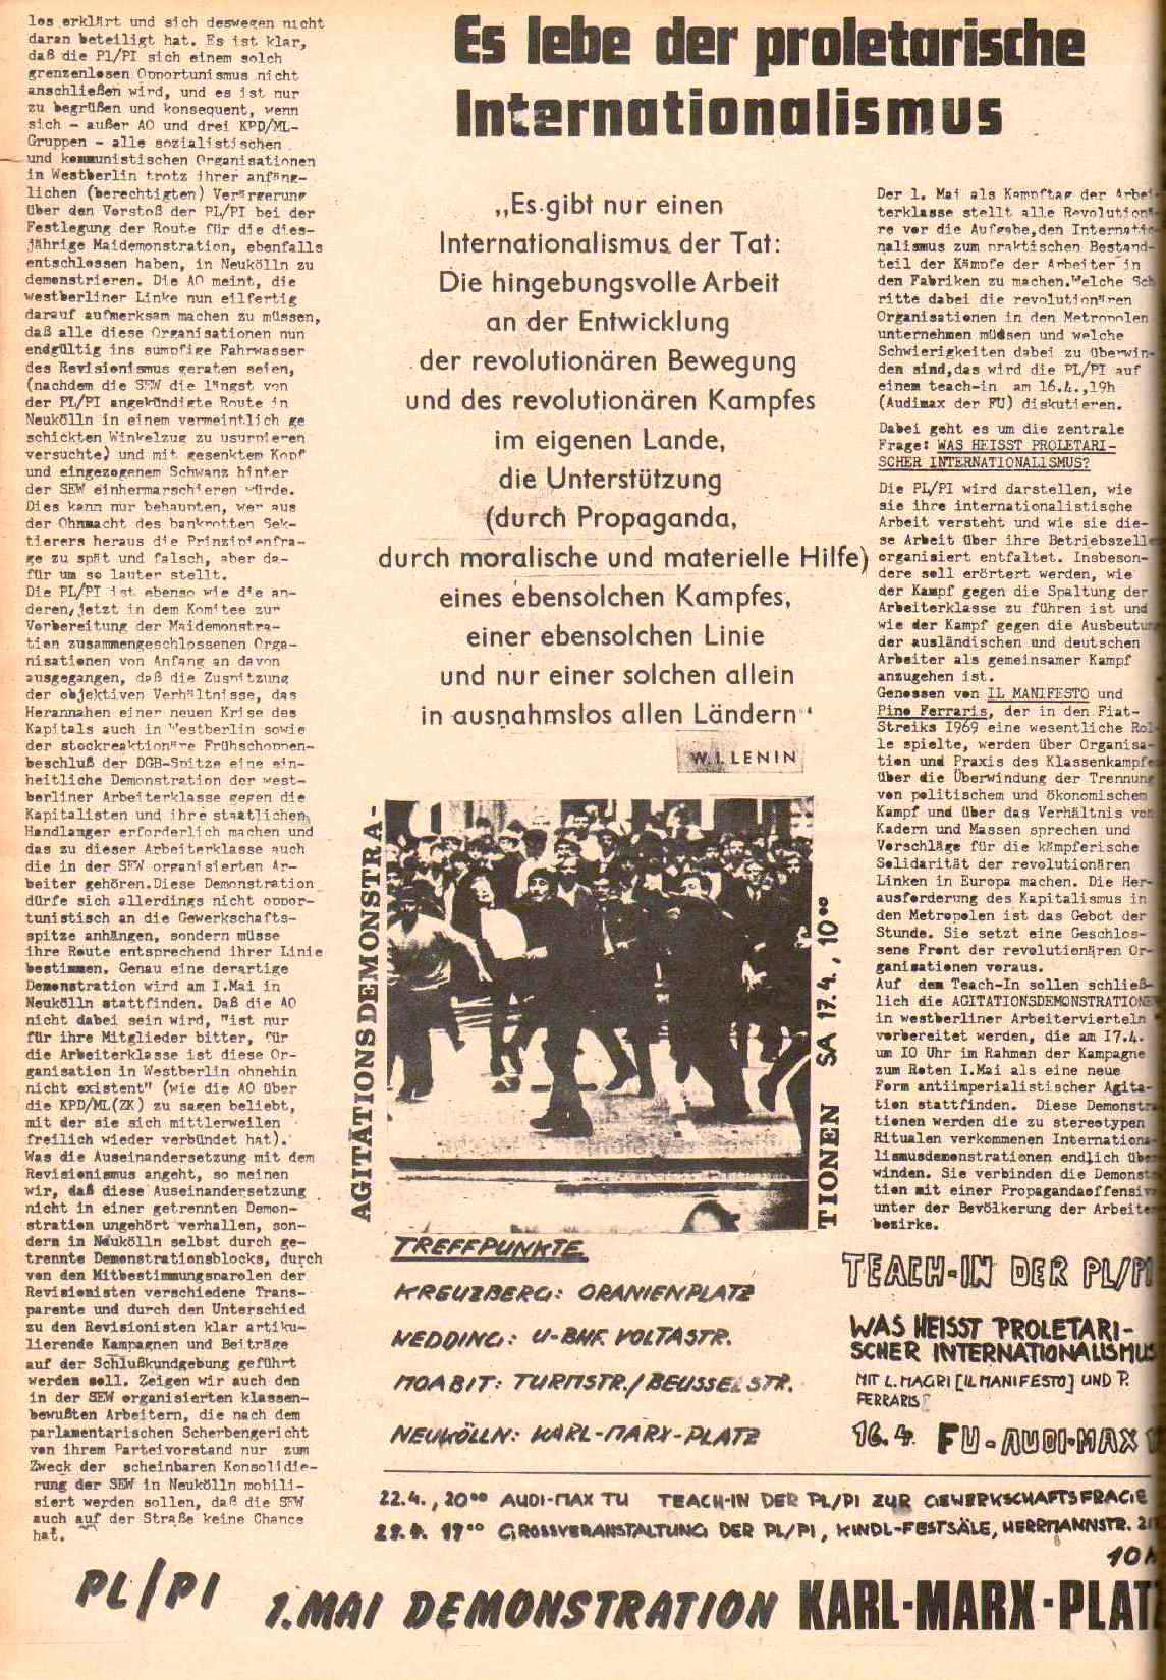 Berlin_Hochschulkampf_1971_06_12